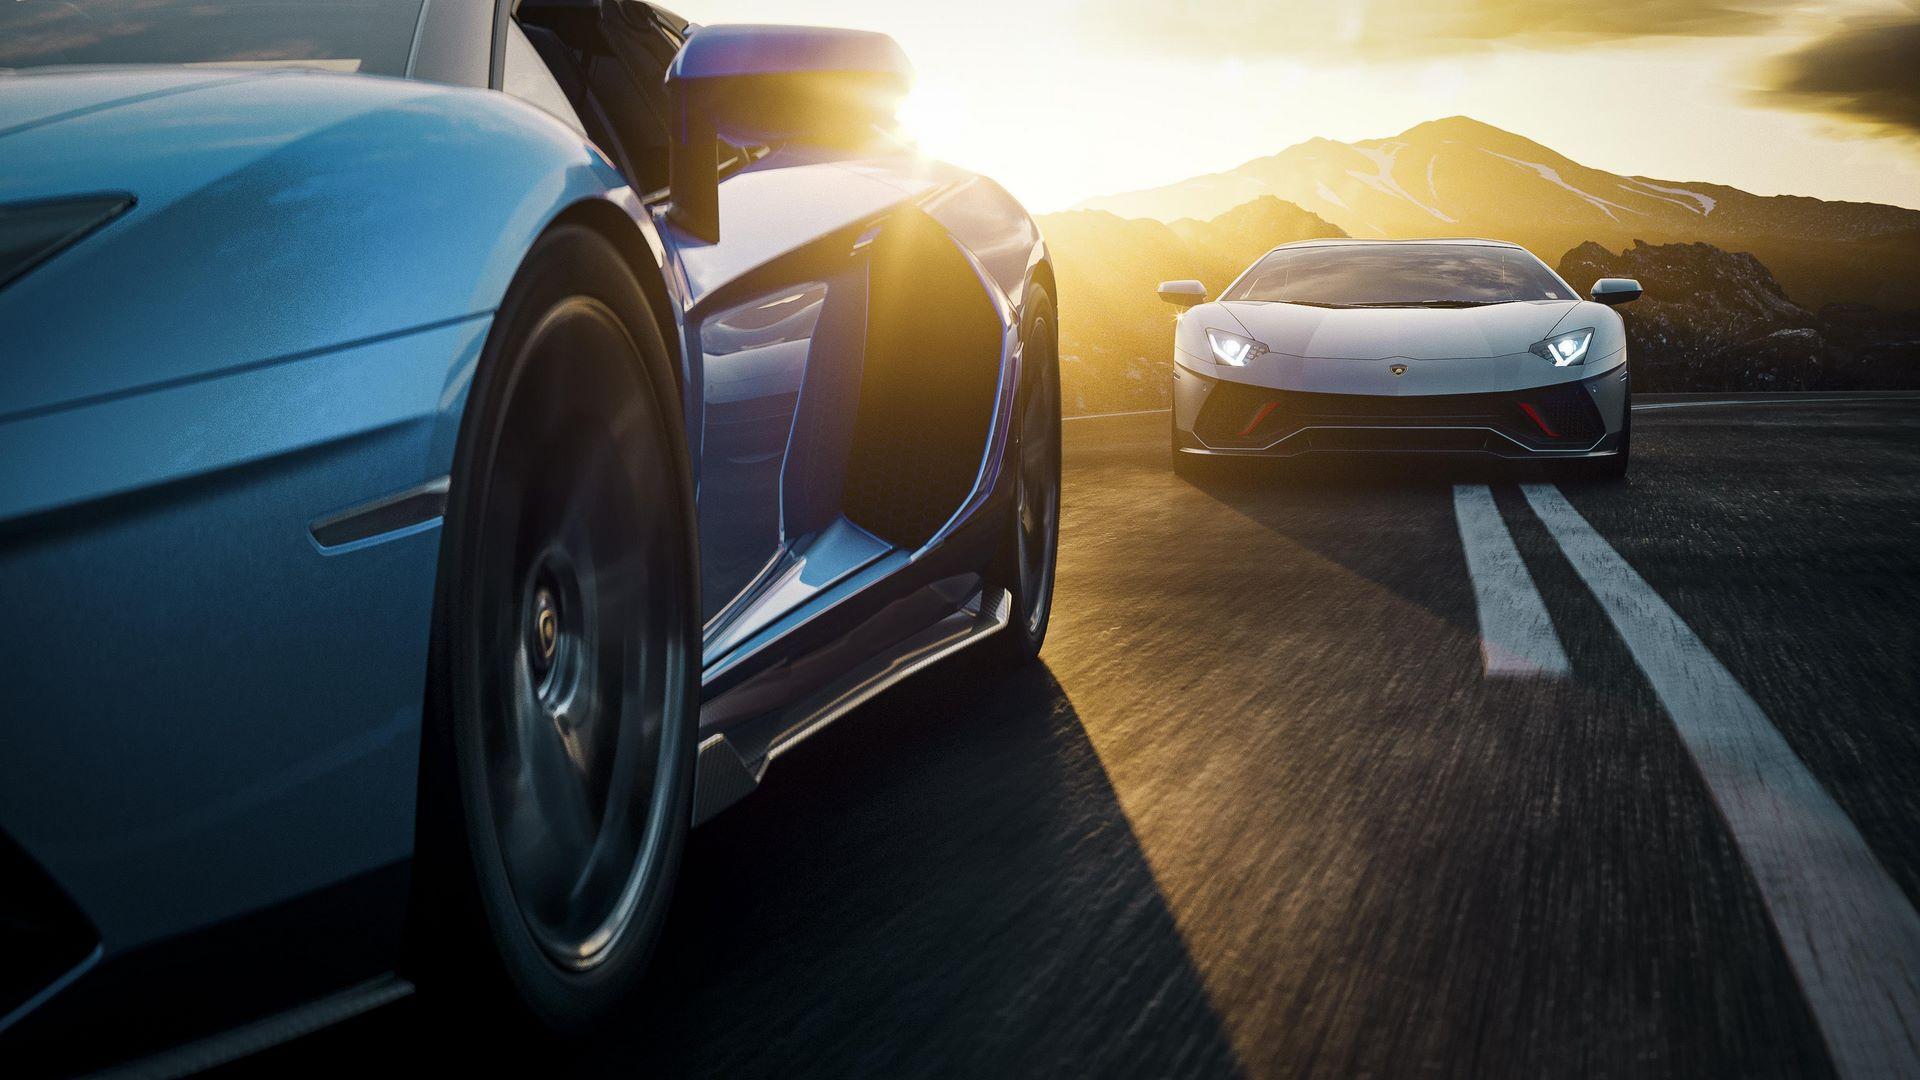 Lamborghini-Aventador-LP780-4-Ultimae-2